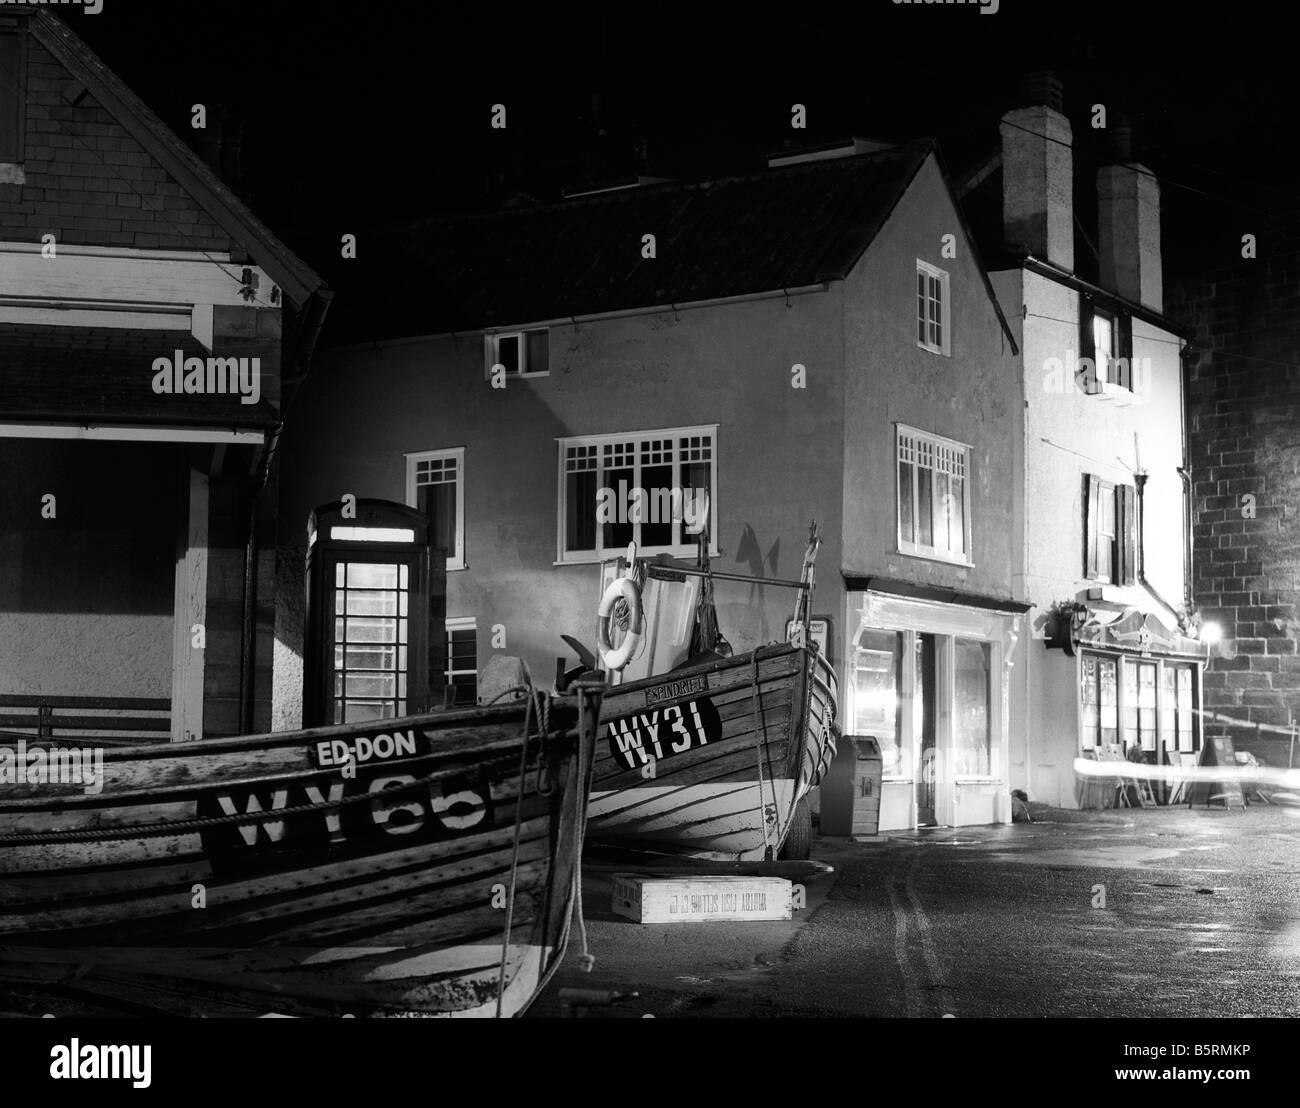 UK England Yorkshire Robin Hoods Bay evening harbourside K6 phone box black and white - Stock Image